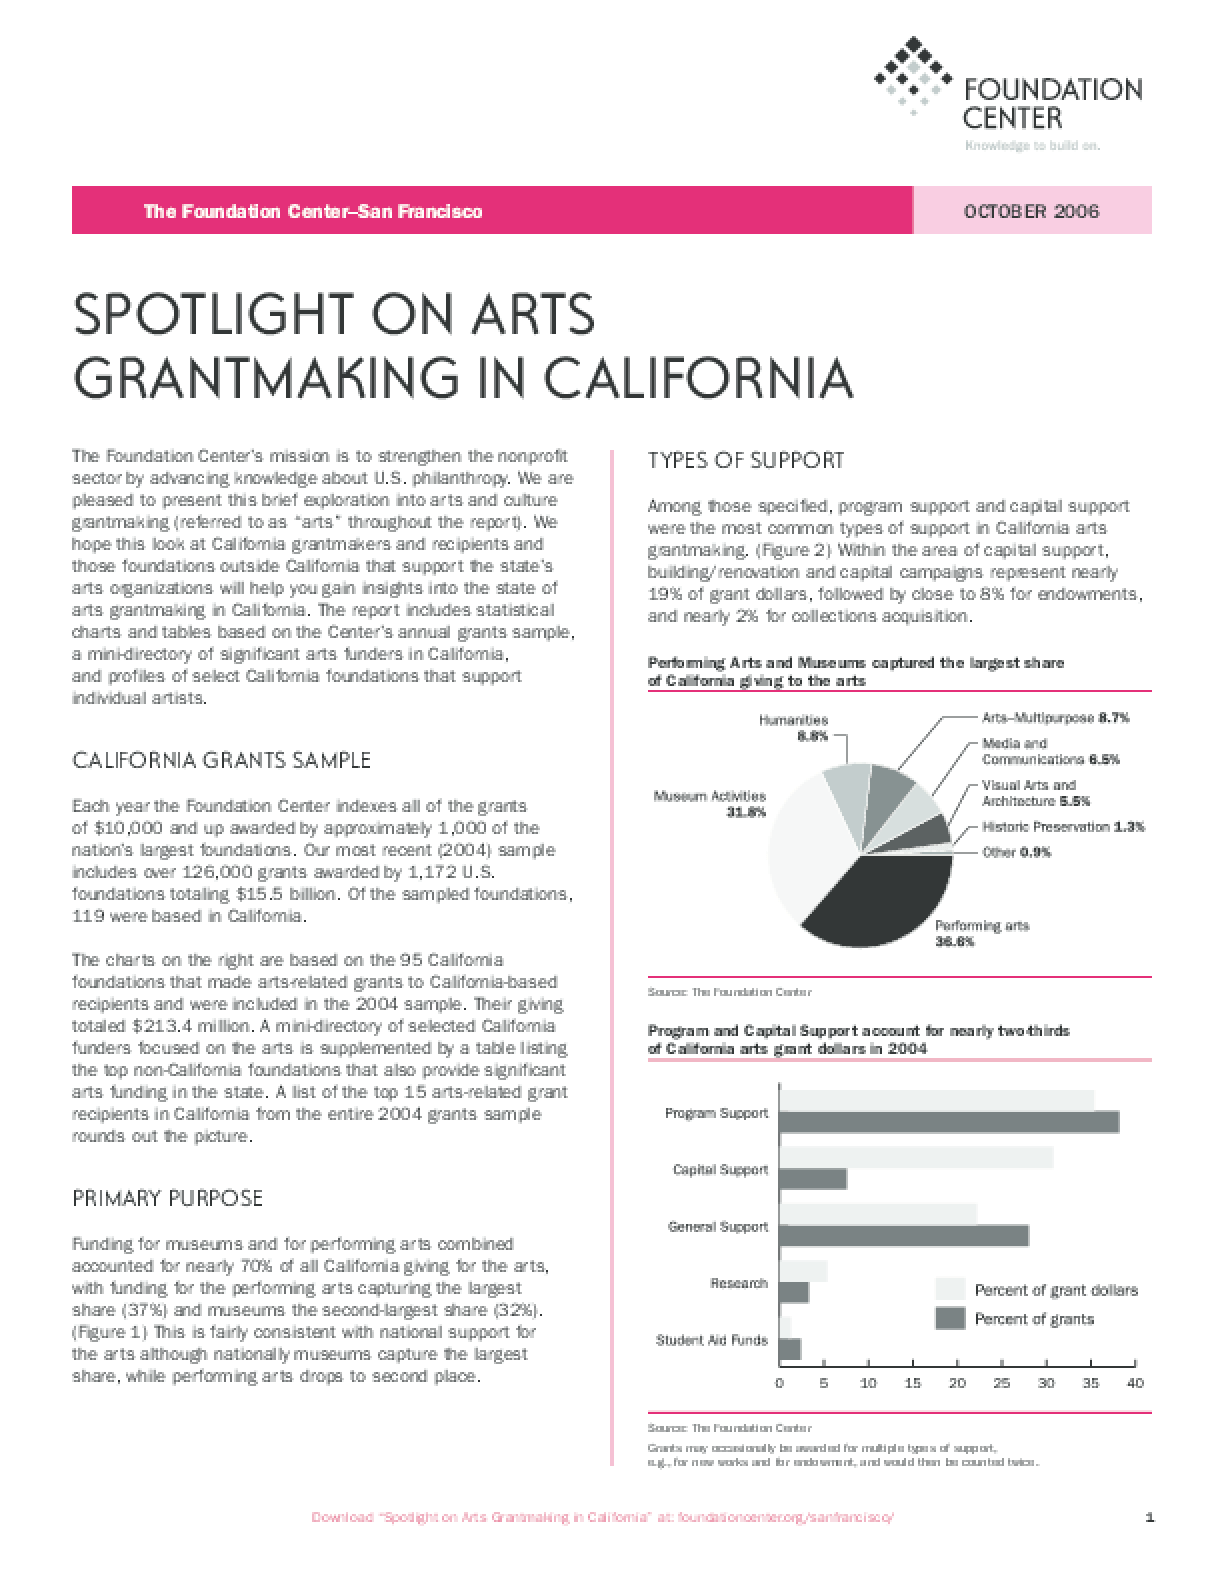 Spotlight on Arts Grantmaking in California 2006